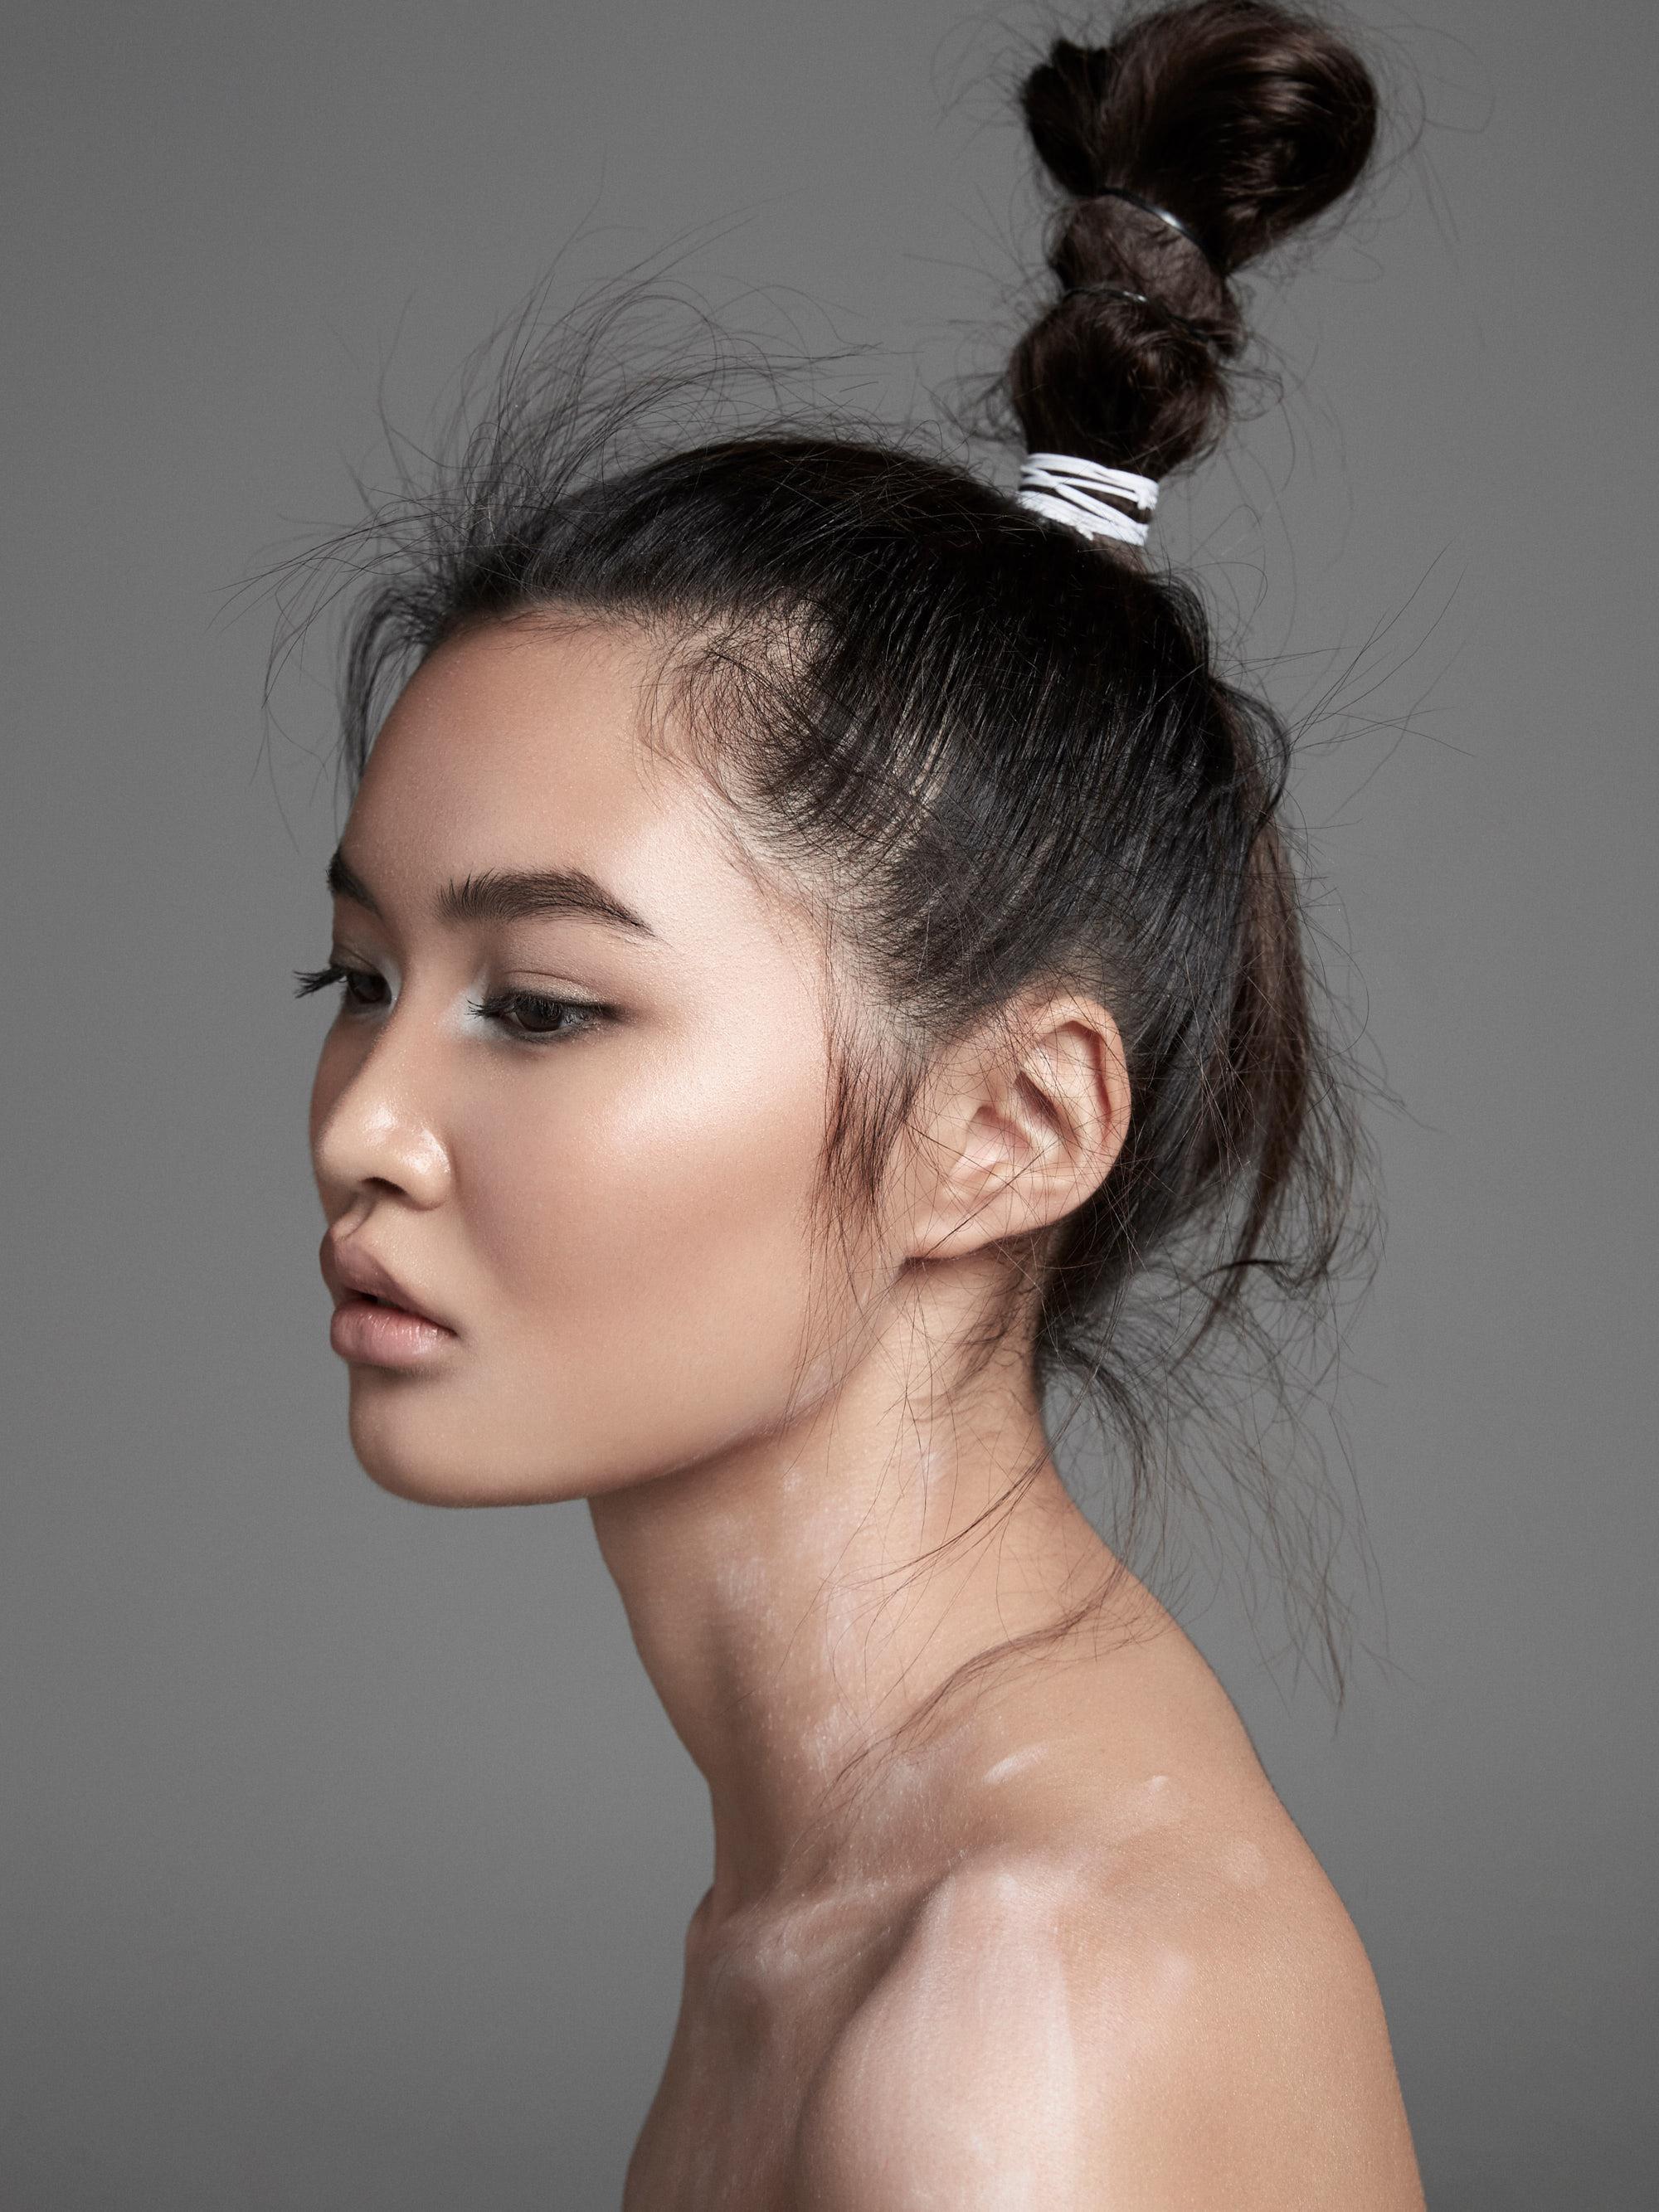 kat wu - beauty shoot.jpg